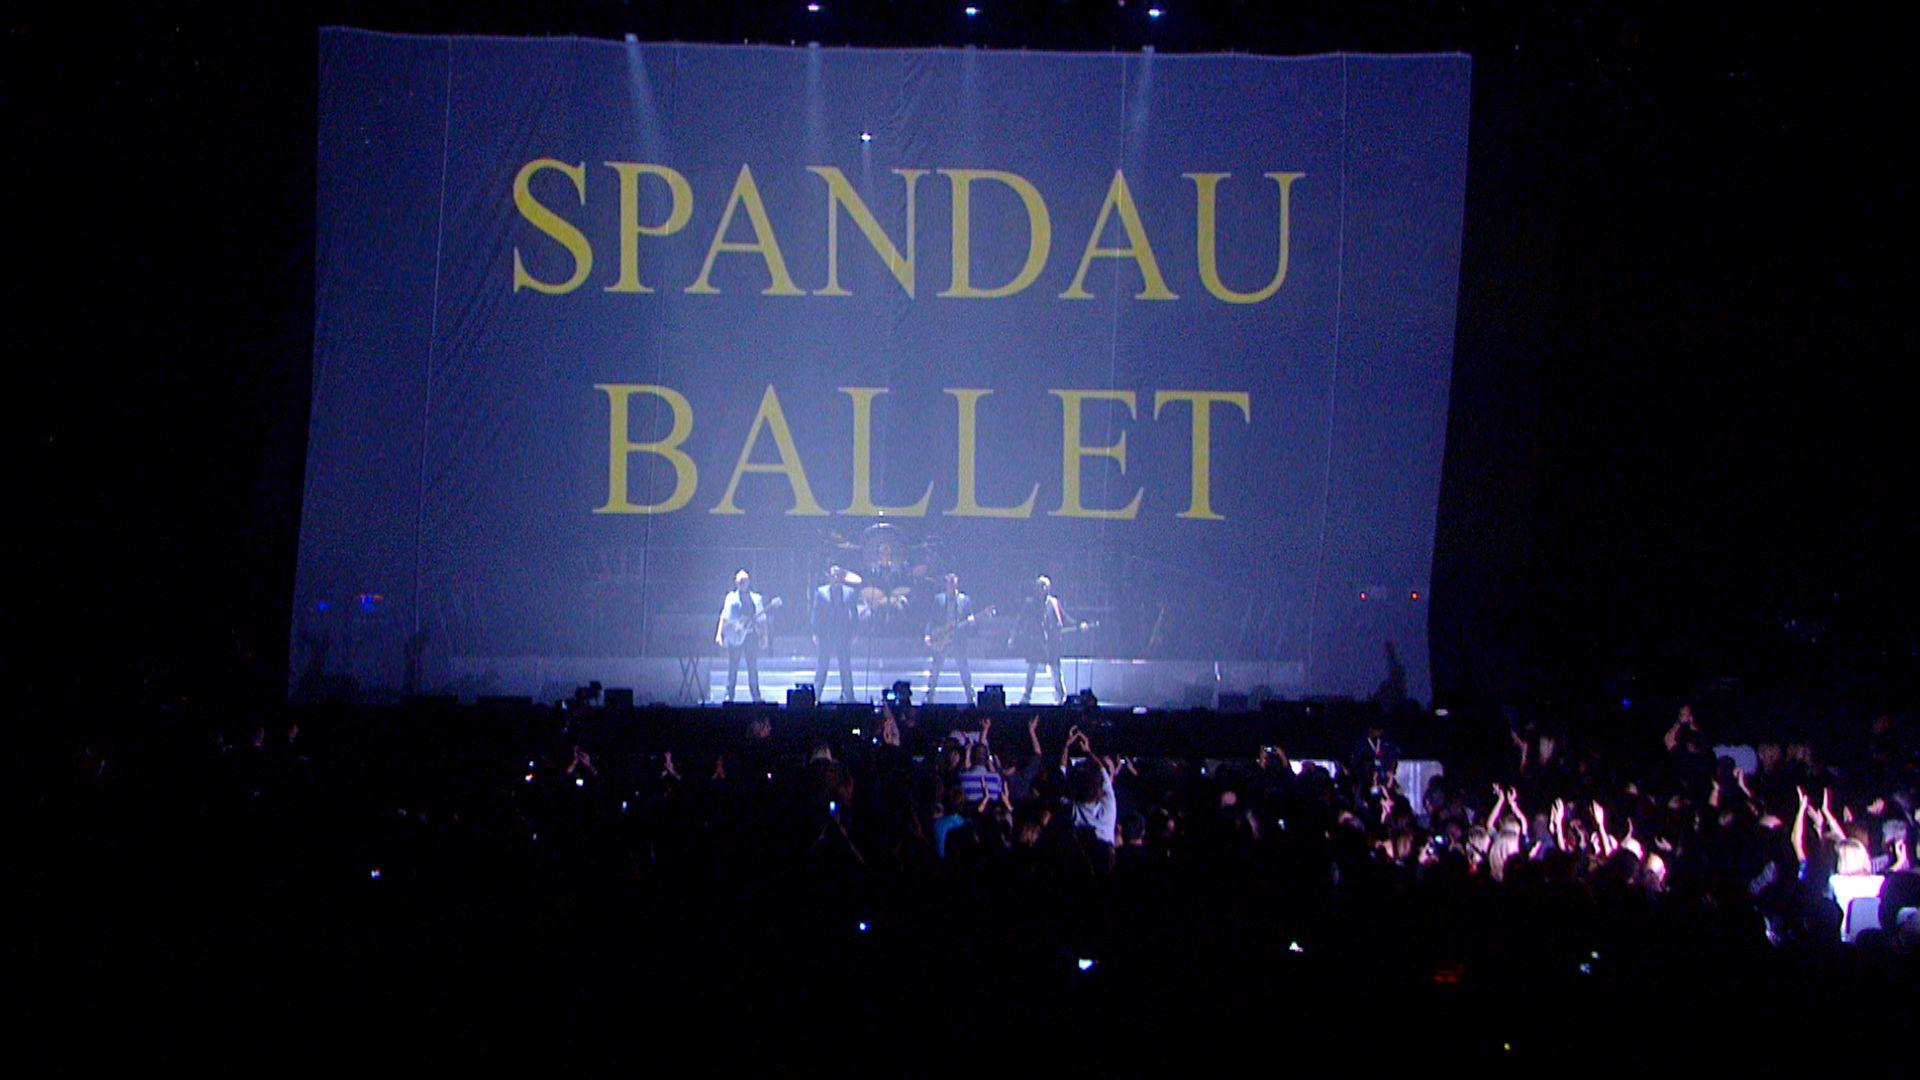 SPANDAU BALLET - Il Film - Soul Boys of the Western World: una scena del documentario